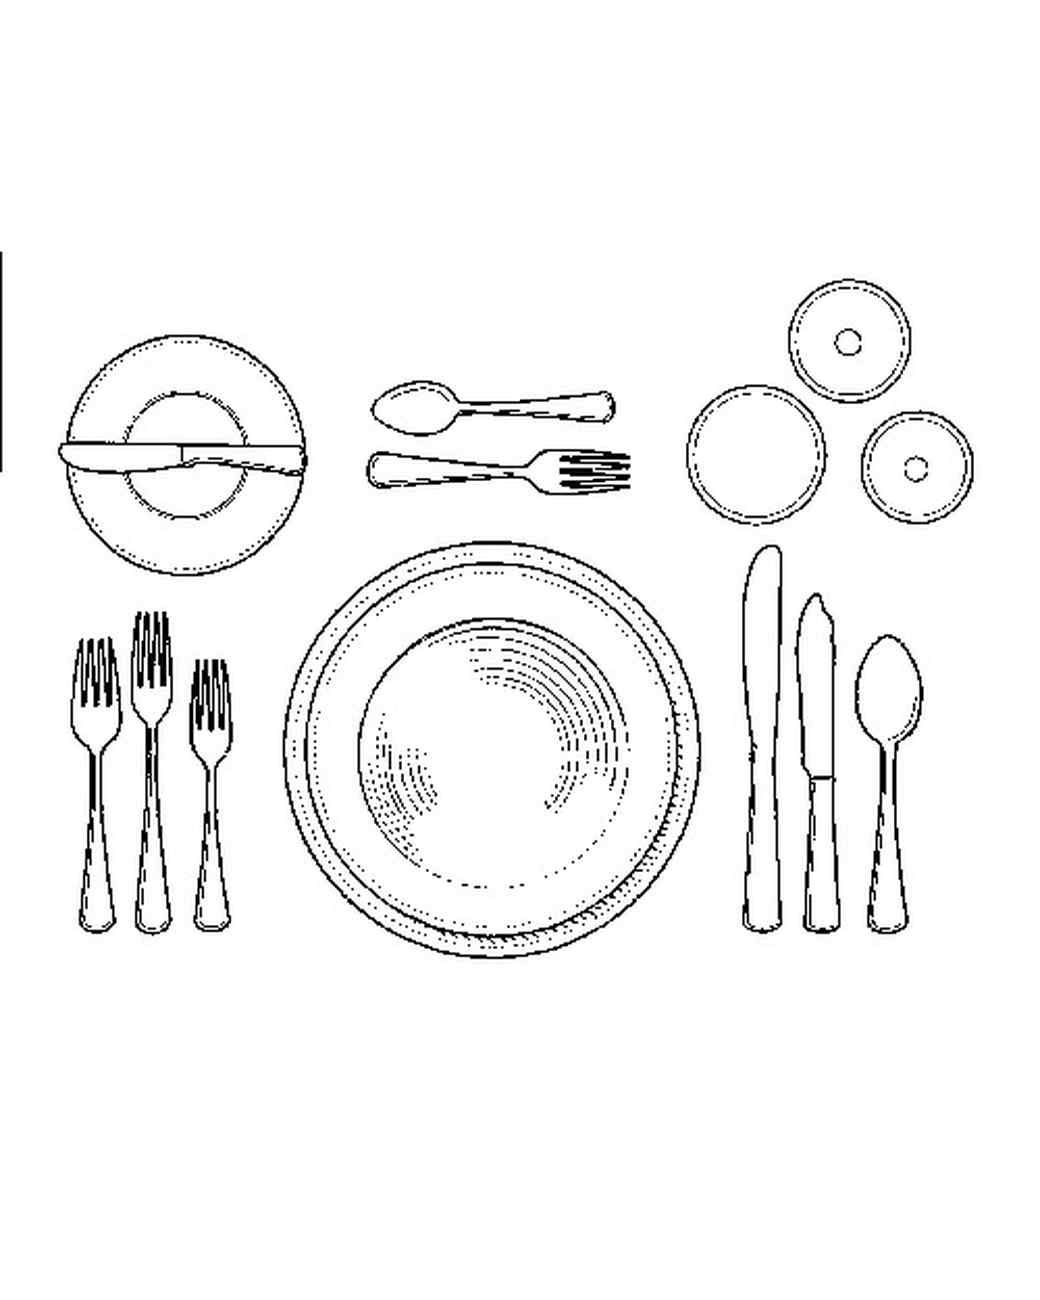 Dinner Table Drawing At Getdrawings